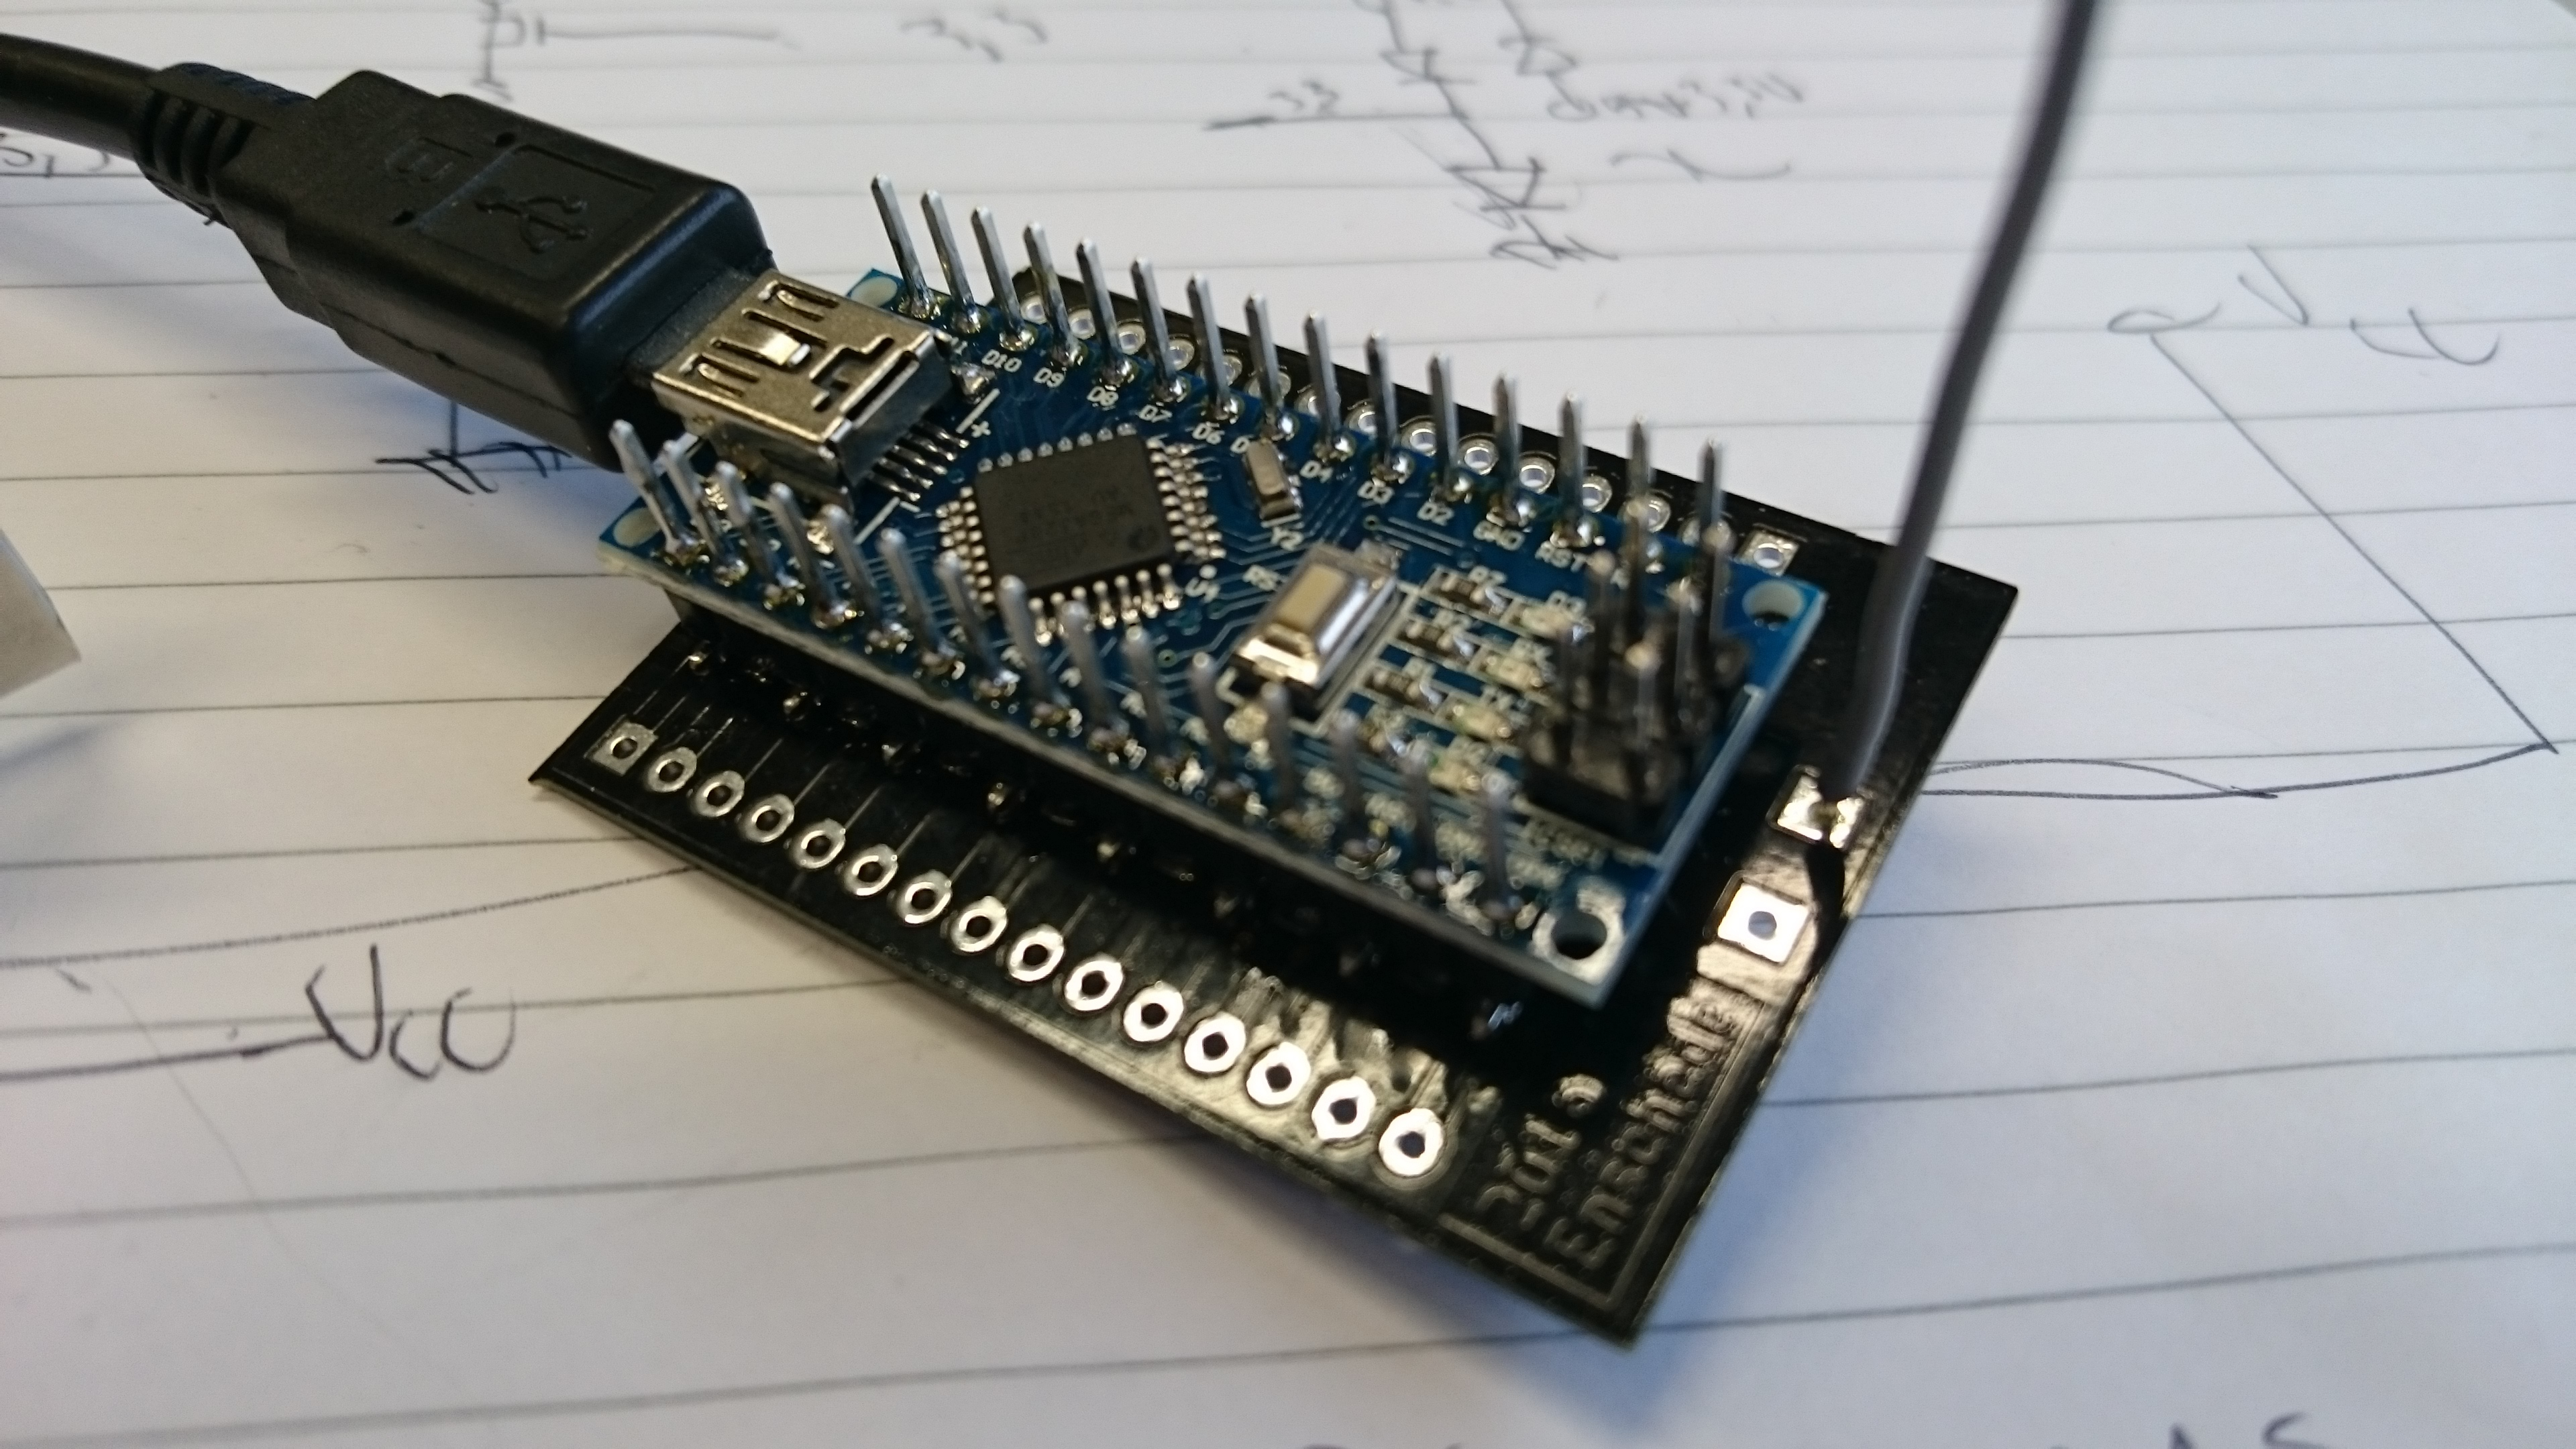 RN 42 Bluetooth - Cookbook Mbed